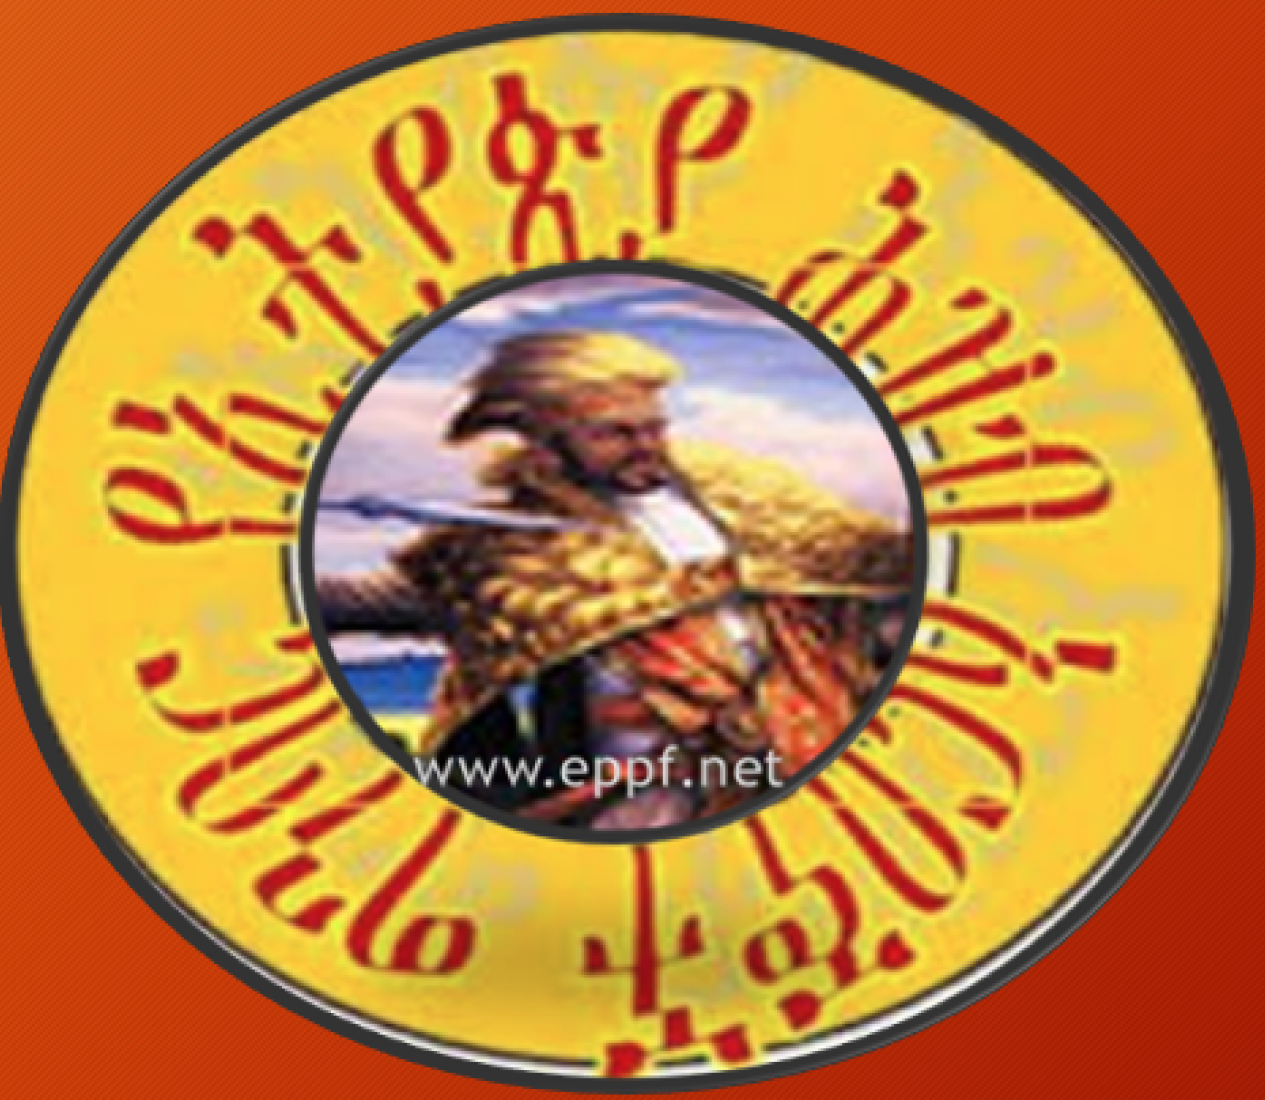 EPPF –             Ethiopian People's Patriotic Front  –   ኢሕአግ